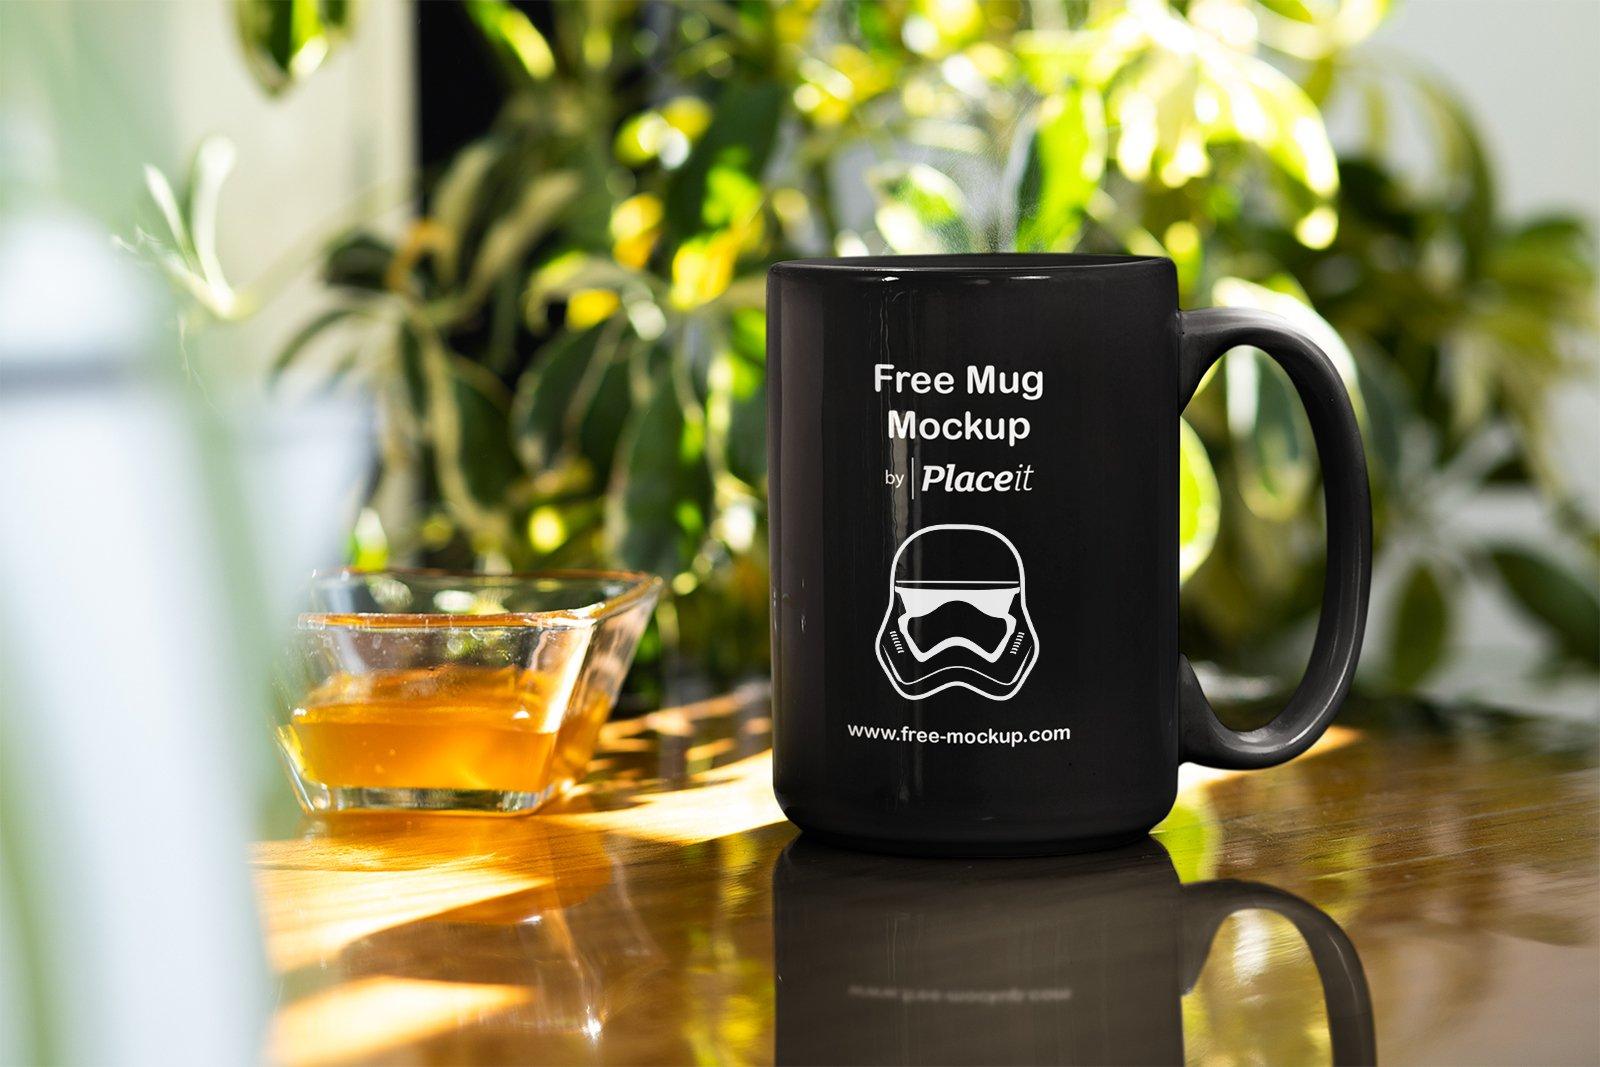 Free Mug Online Mockup 01